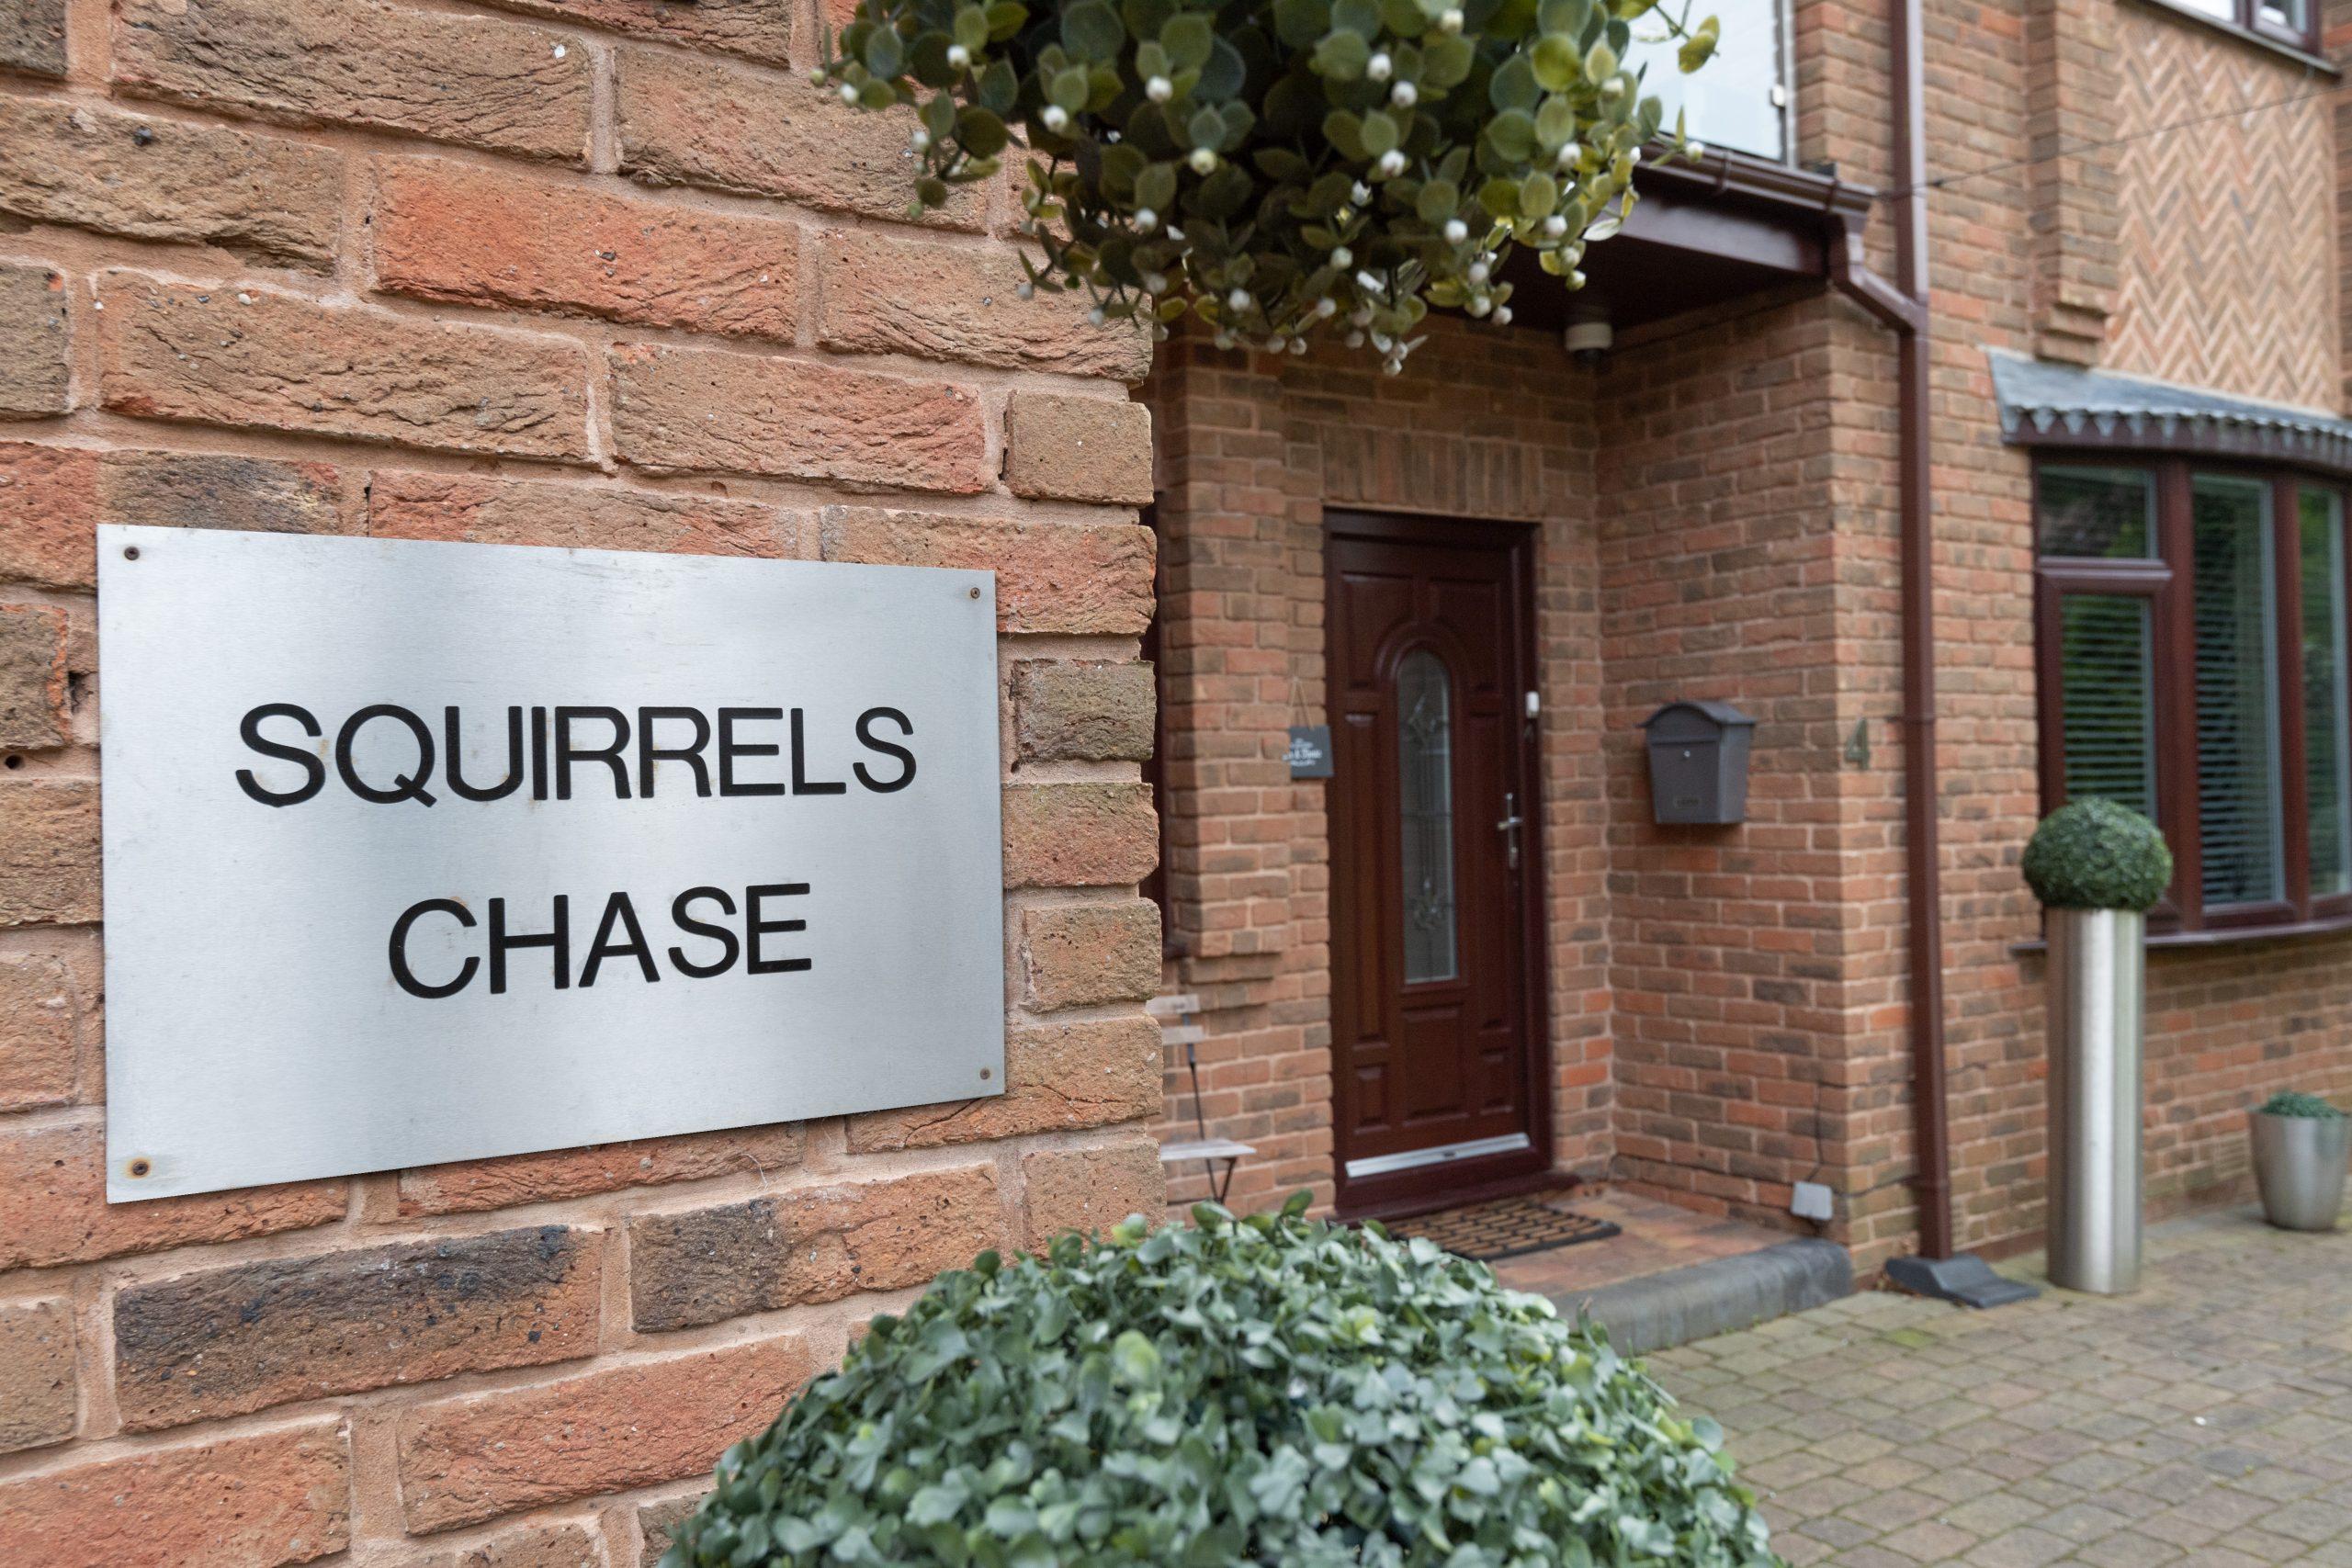 Squirrels Chase